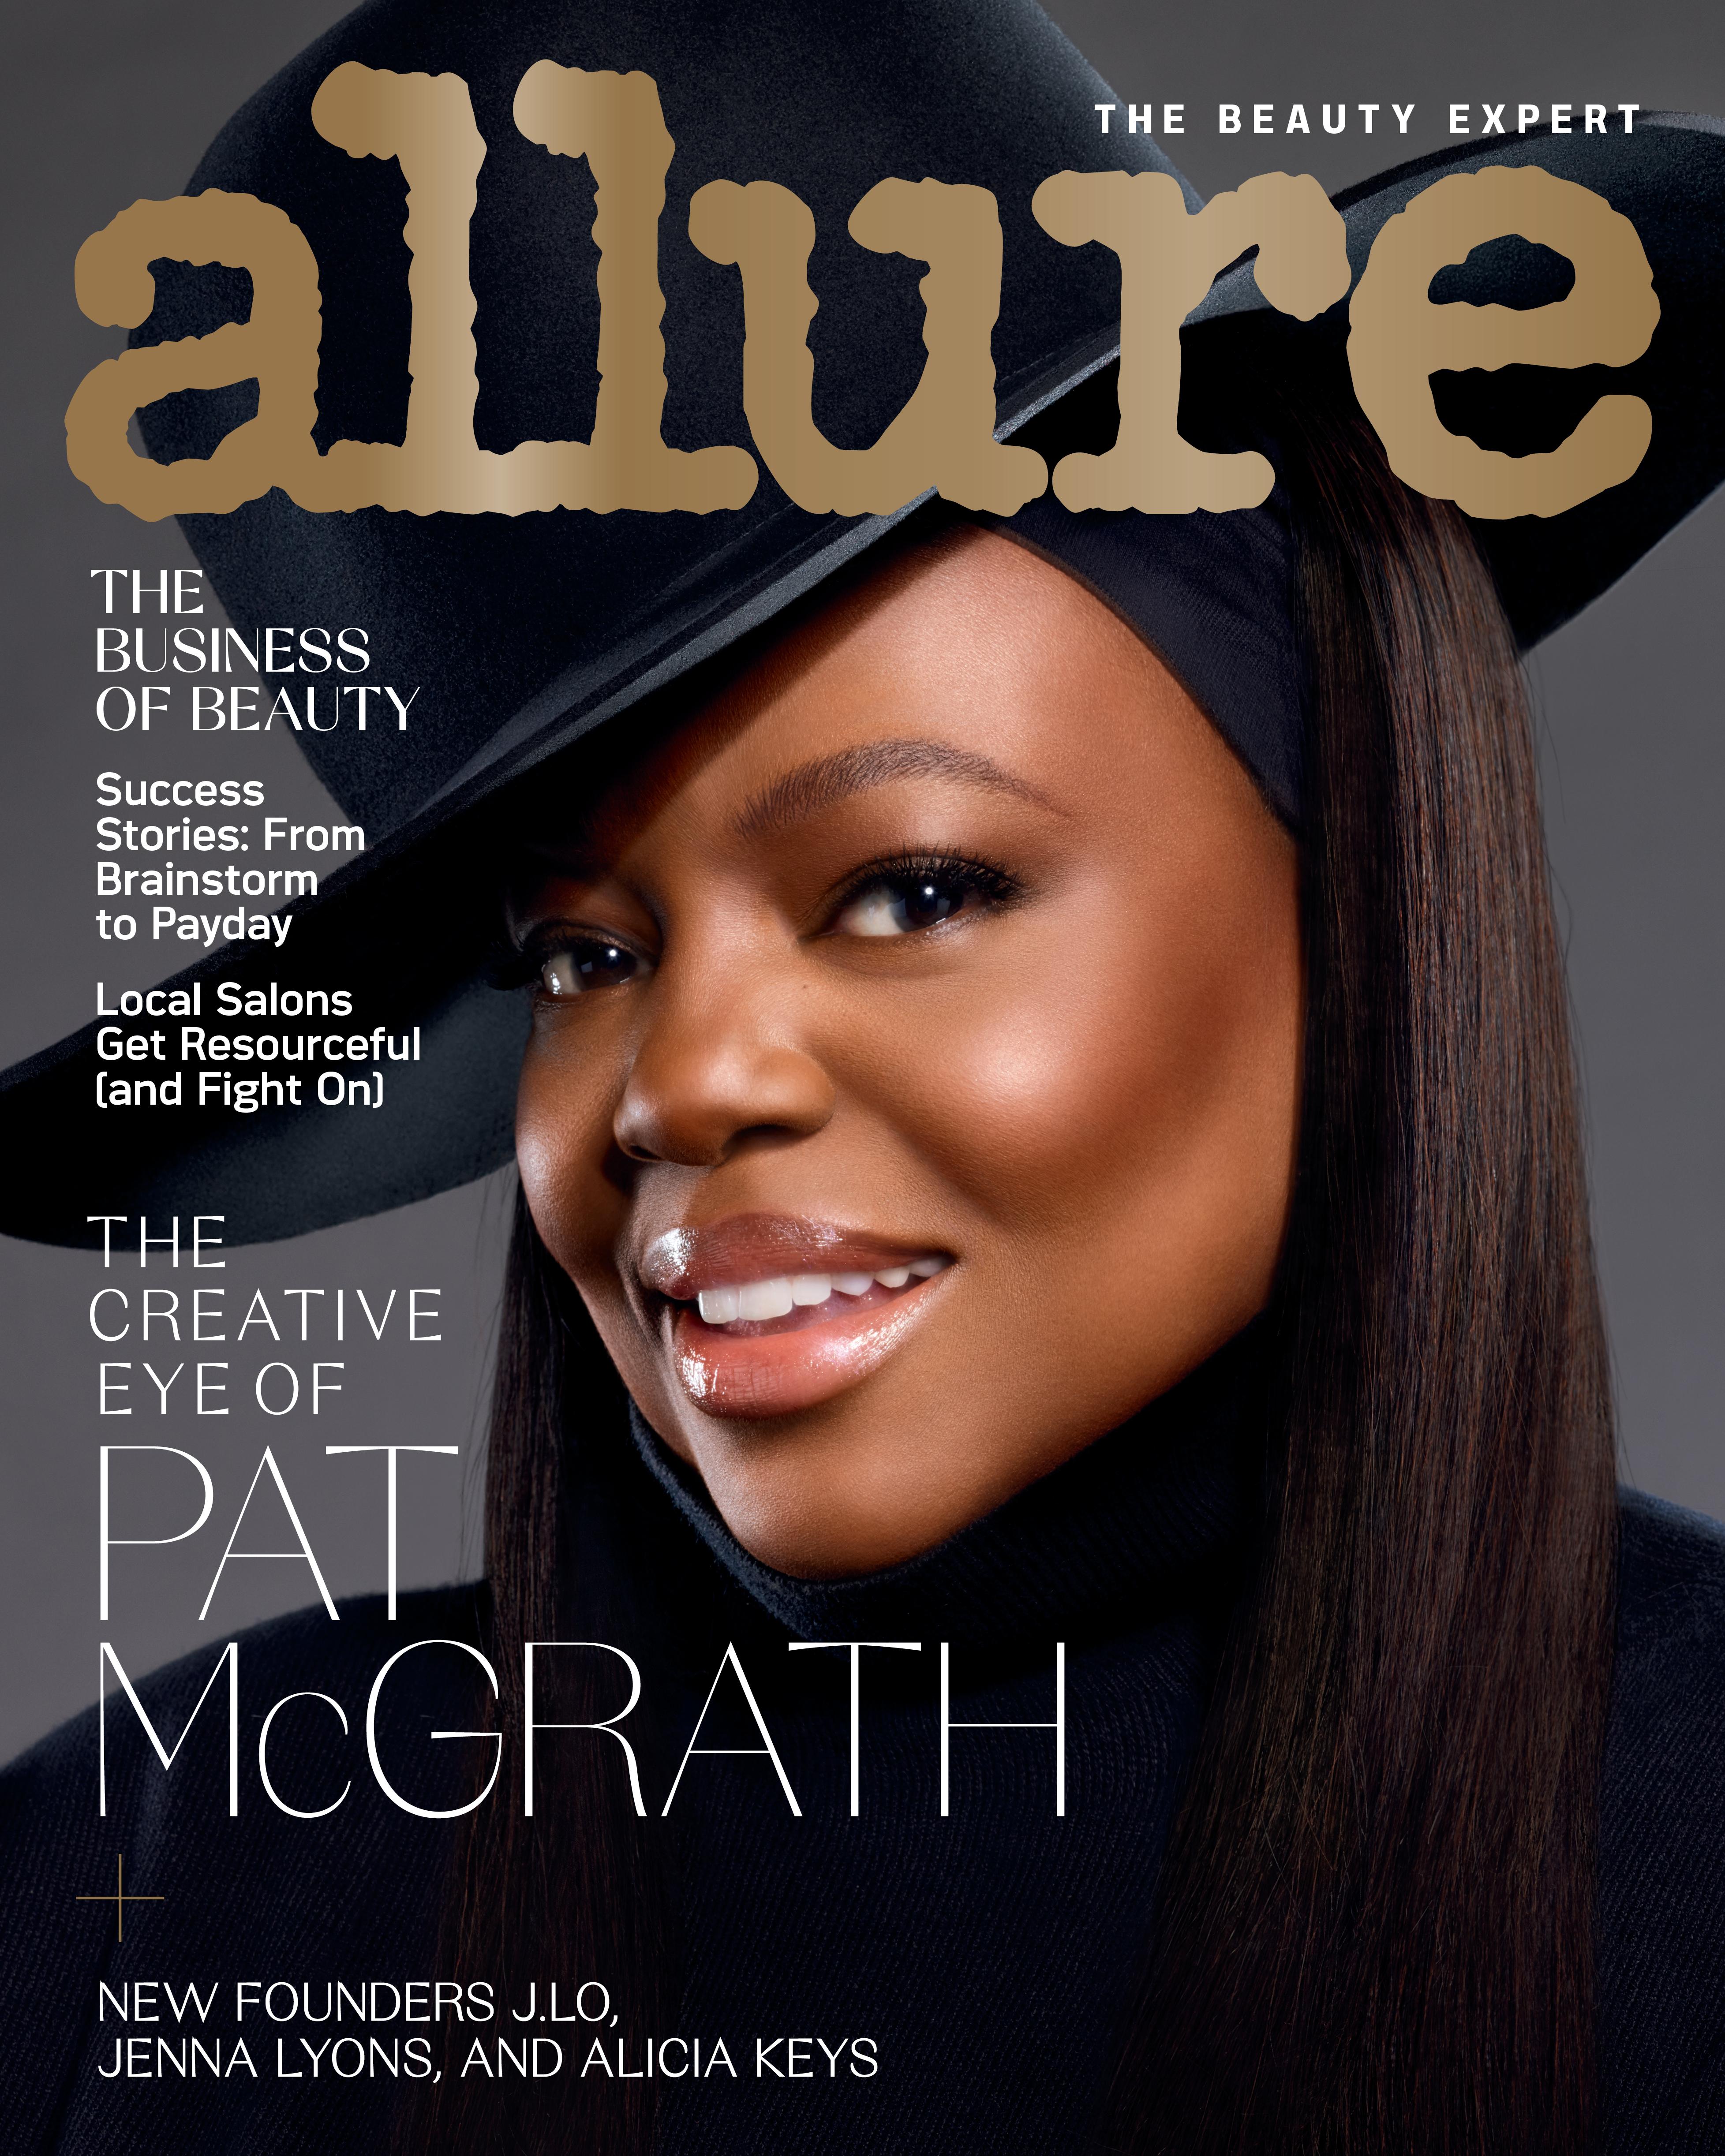 Pat McGrath Allure Cover February Cover